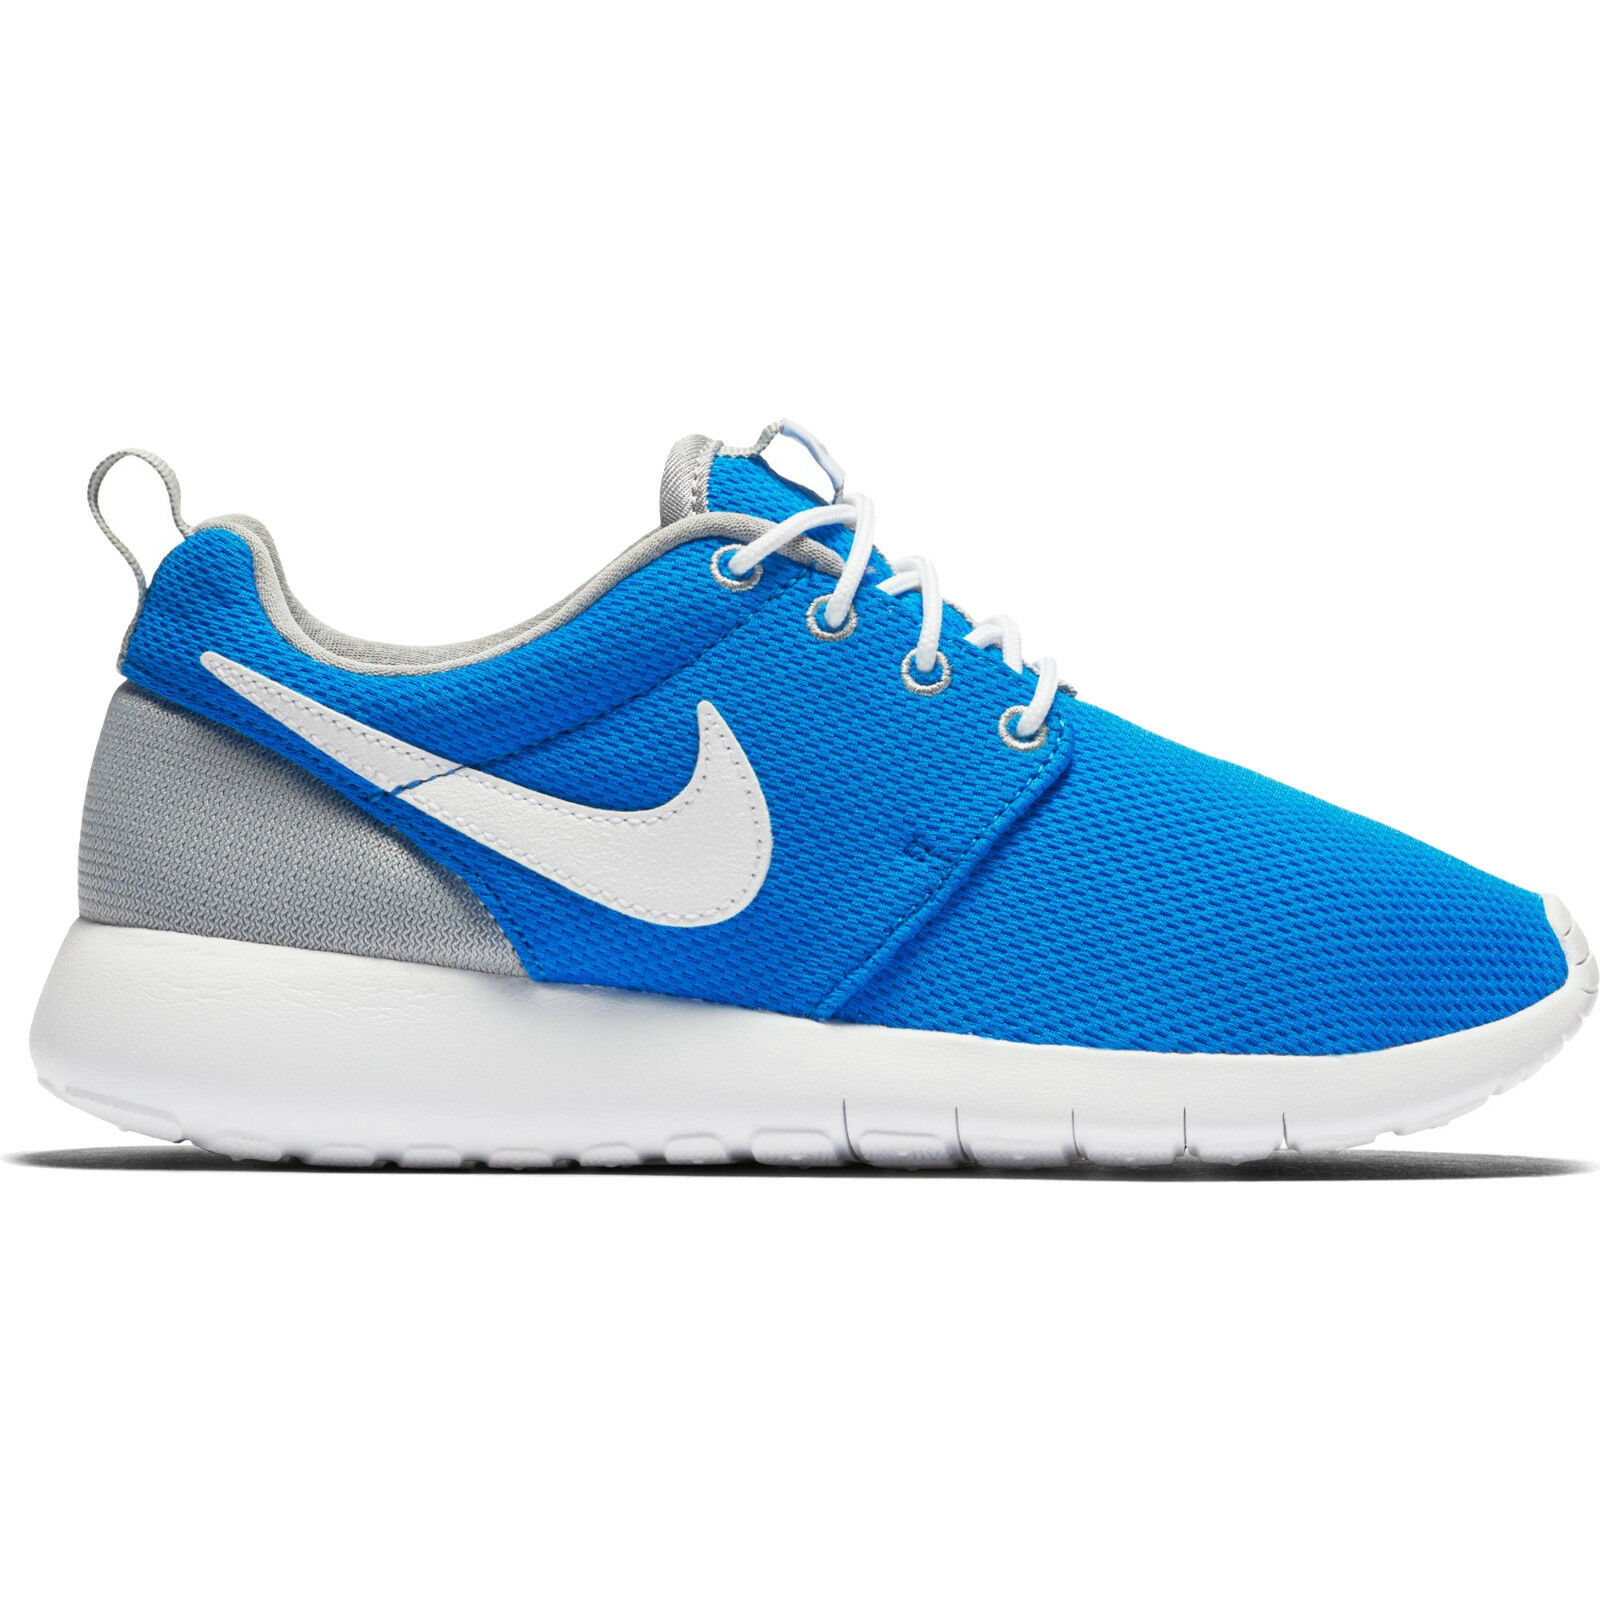 Zapatos promocionales para hombres y mujeres Womens Nike Roshe One GS Blau Gr:36,5 Presto Moire Sneaker 599728-412 free